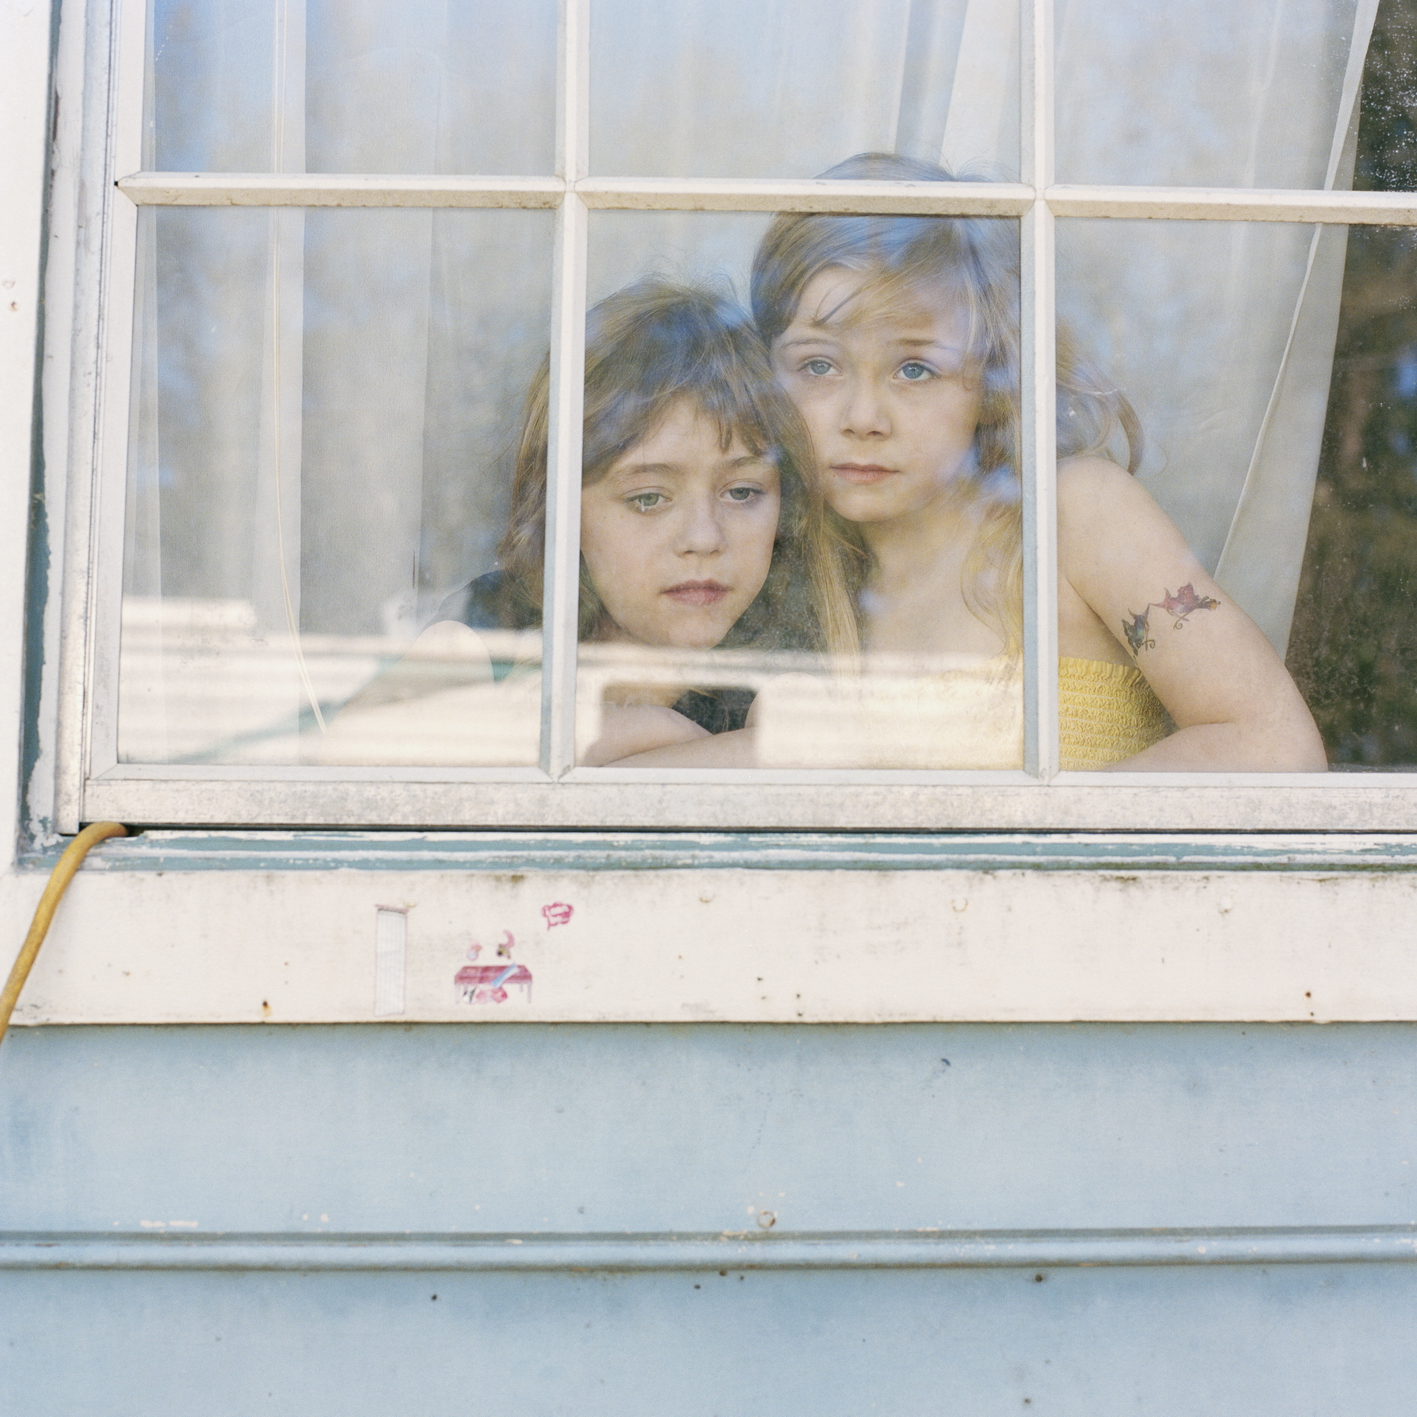 09_Trailer Sisters - Alabama 2012®RonanGuillou